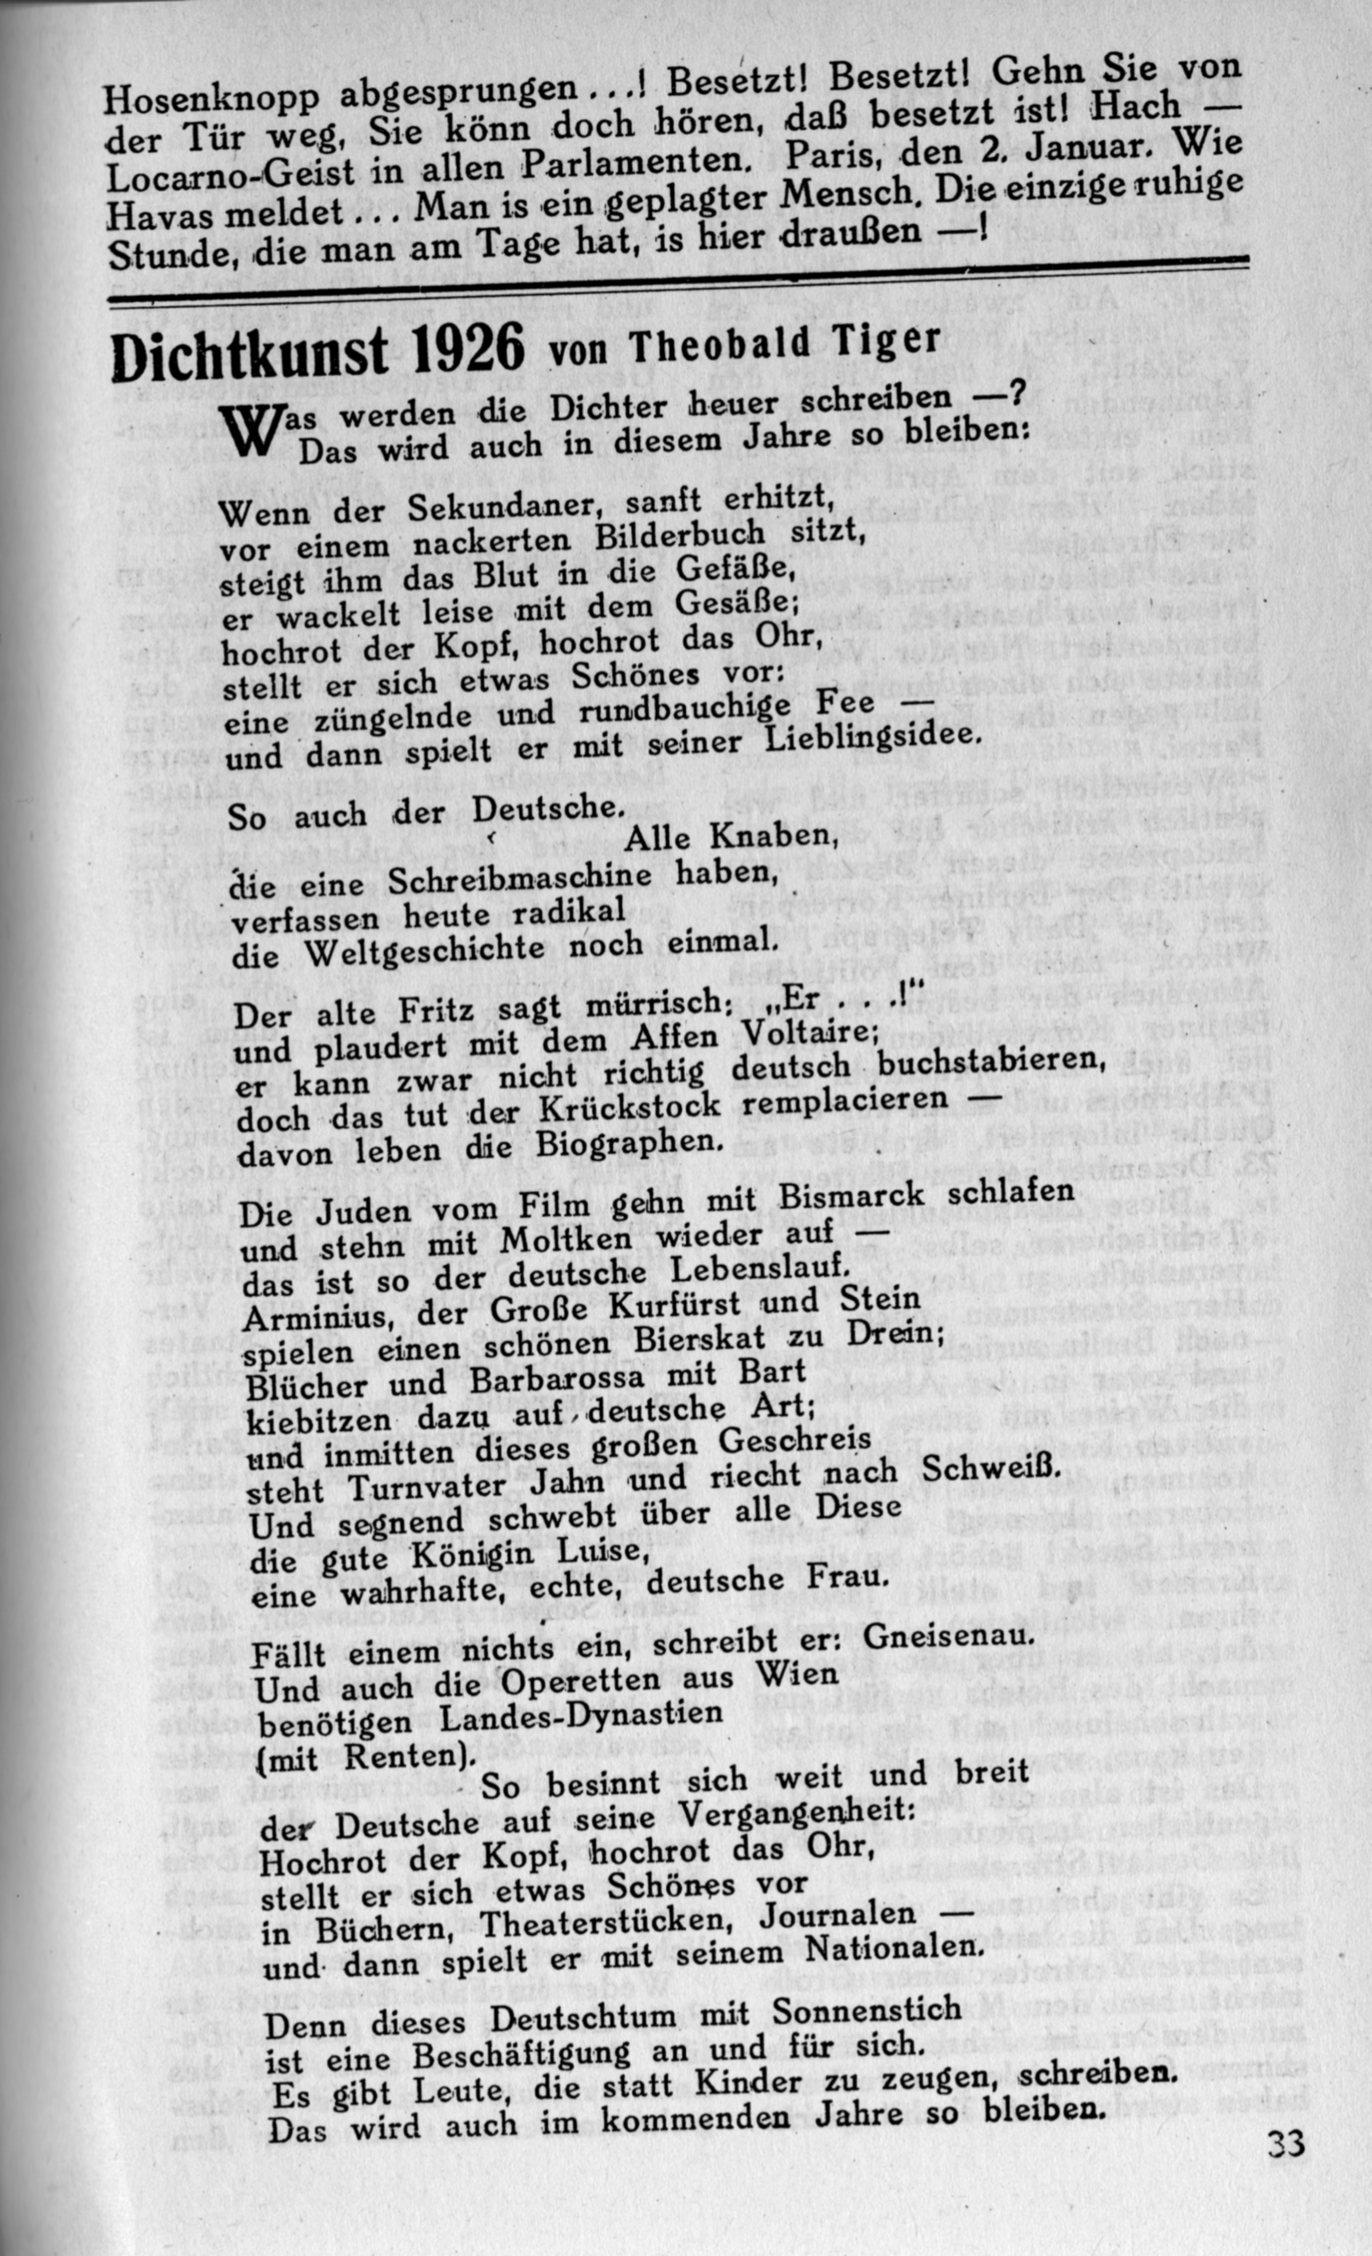 File:Weltbuehne 1926 I 033.jpg - Wikimedia Commons